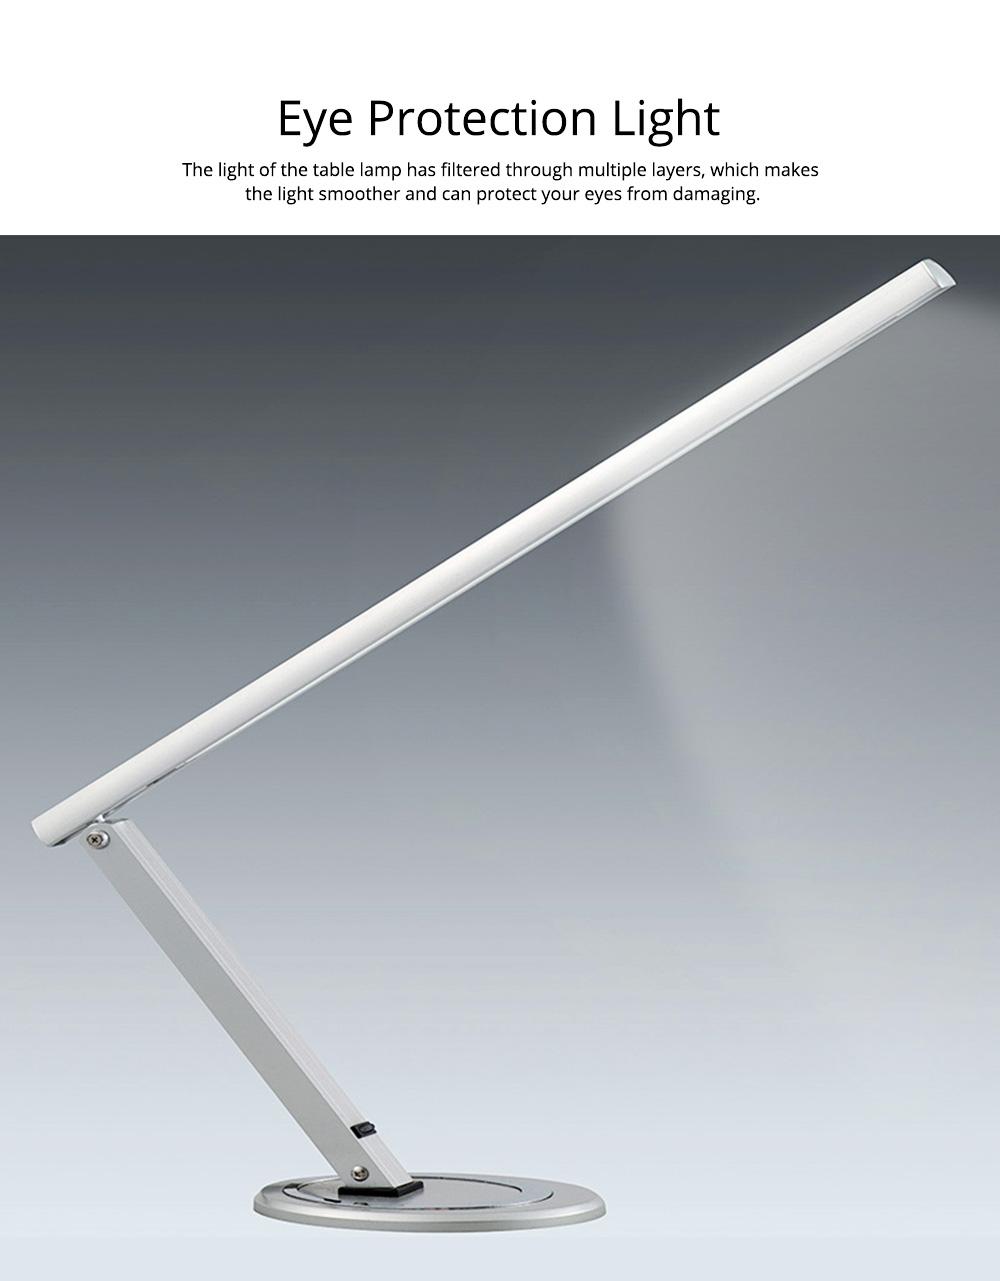 Creative Minimalist Fashion Large Foldable Eye Protection Table Lamp, Modern Tough Aluminum Bedside Office Light 10W Cool White 2